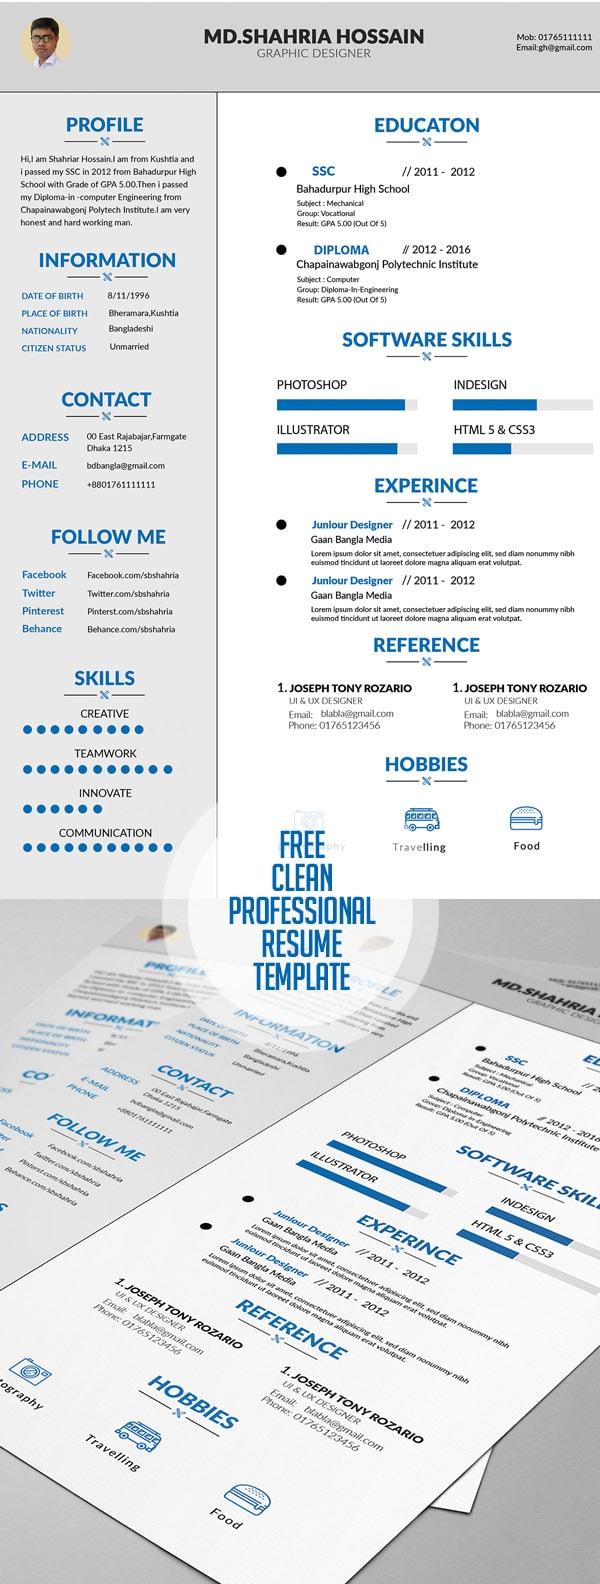 Template Resume / CV Terbaru 2017 - Free Clean Proffesional Resume Design